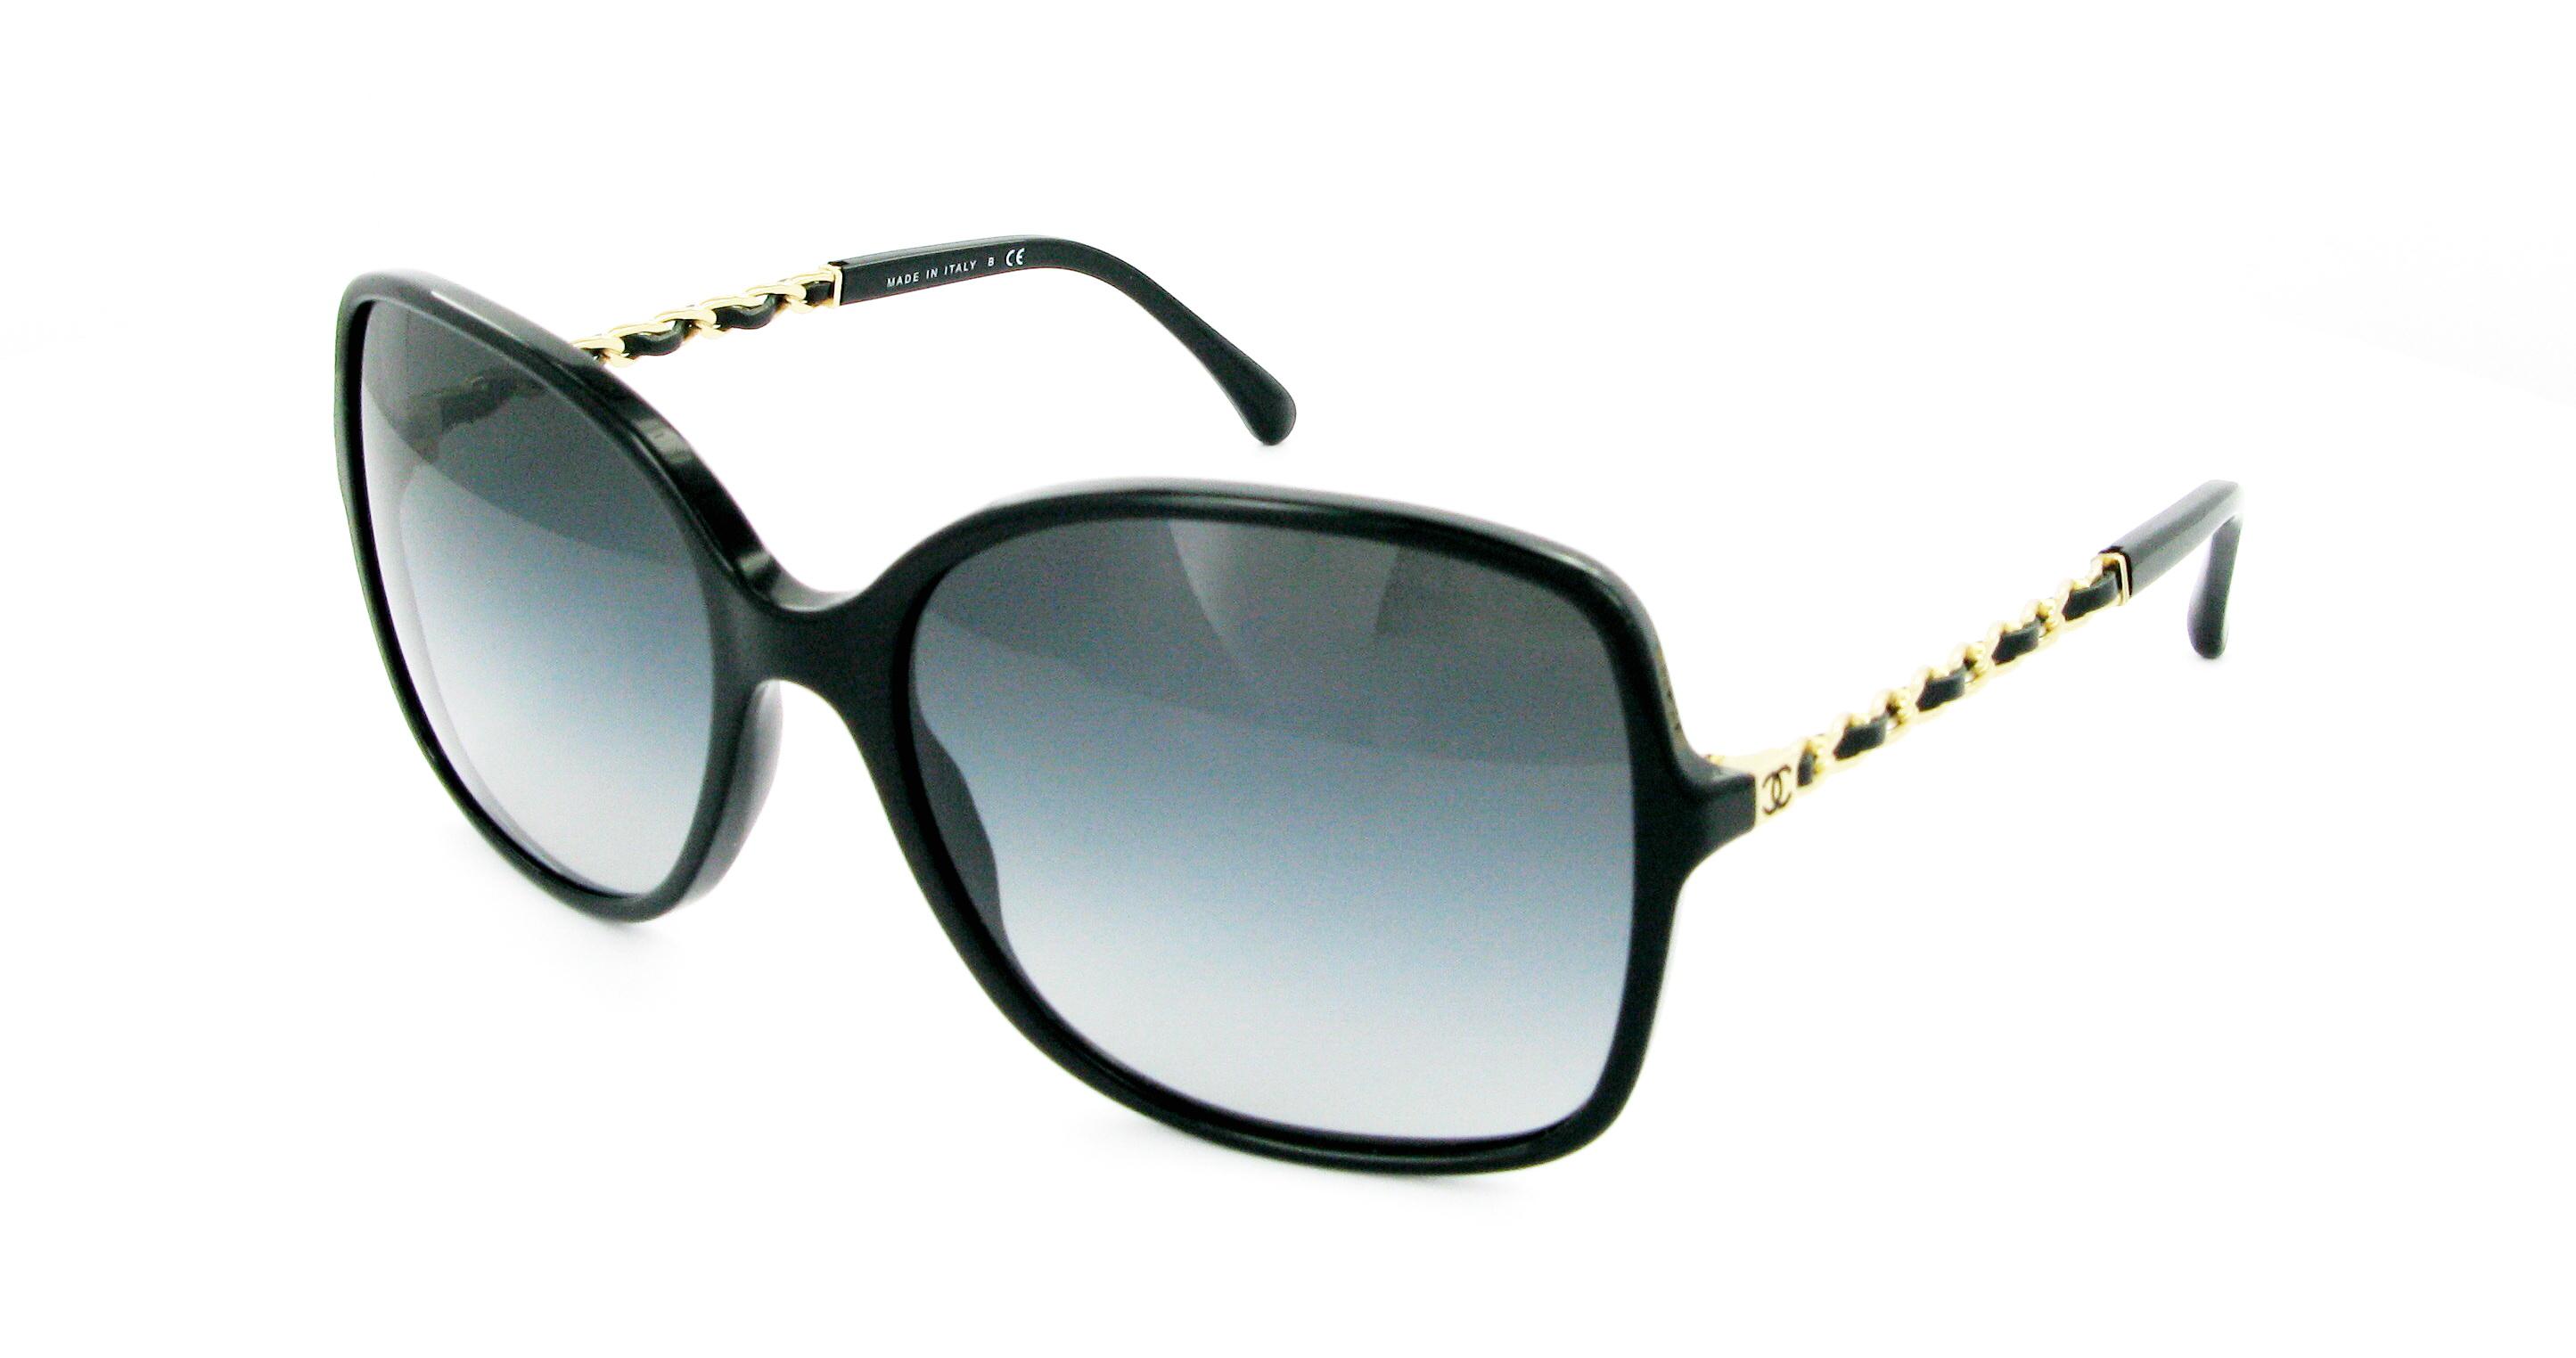 lunettes de soleil aviateur femme chanel. Black Bedroom Furniture Sets. Home Design Ideas